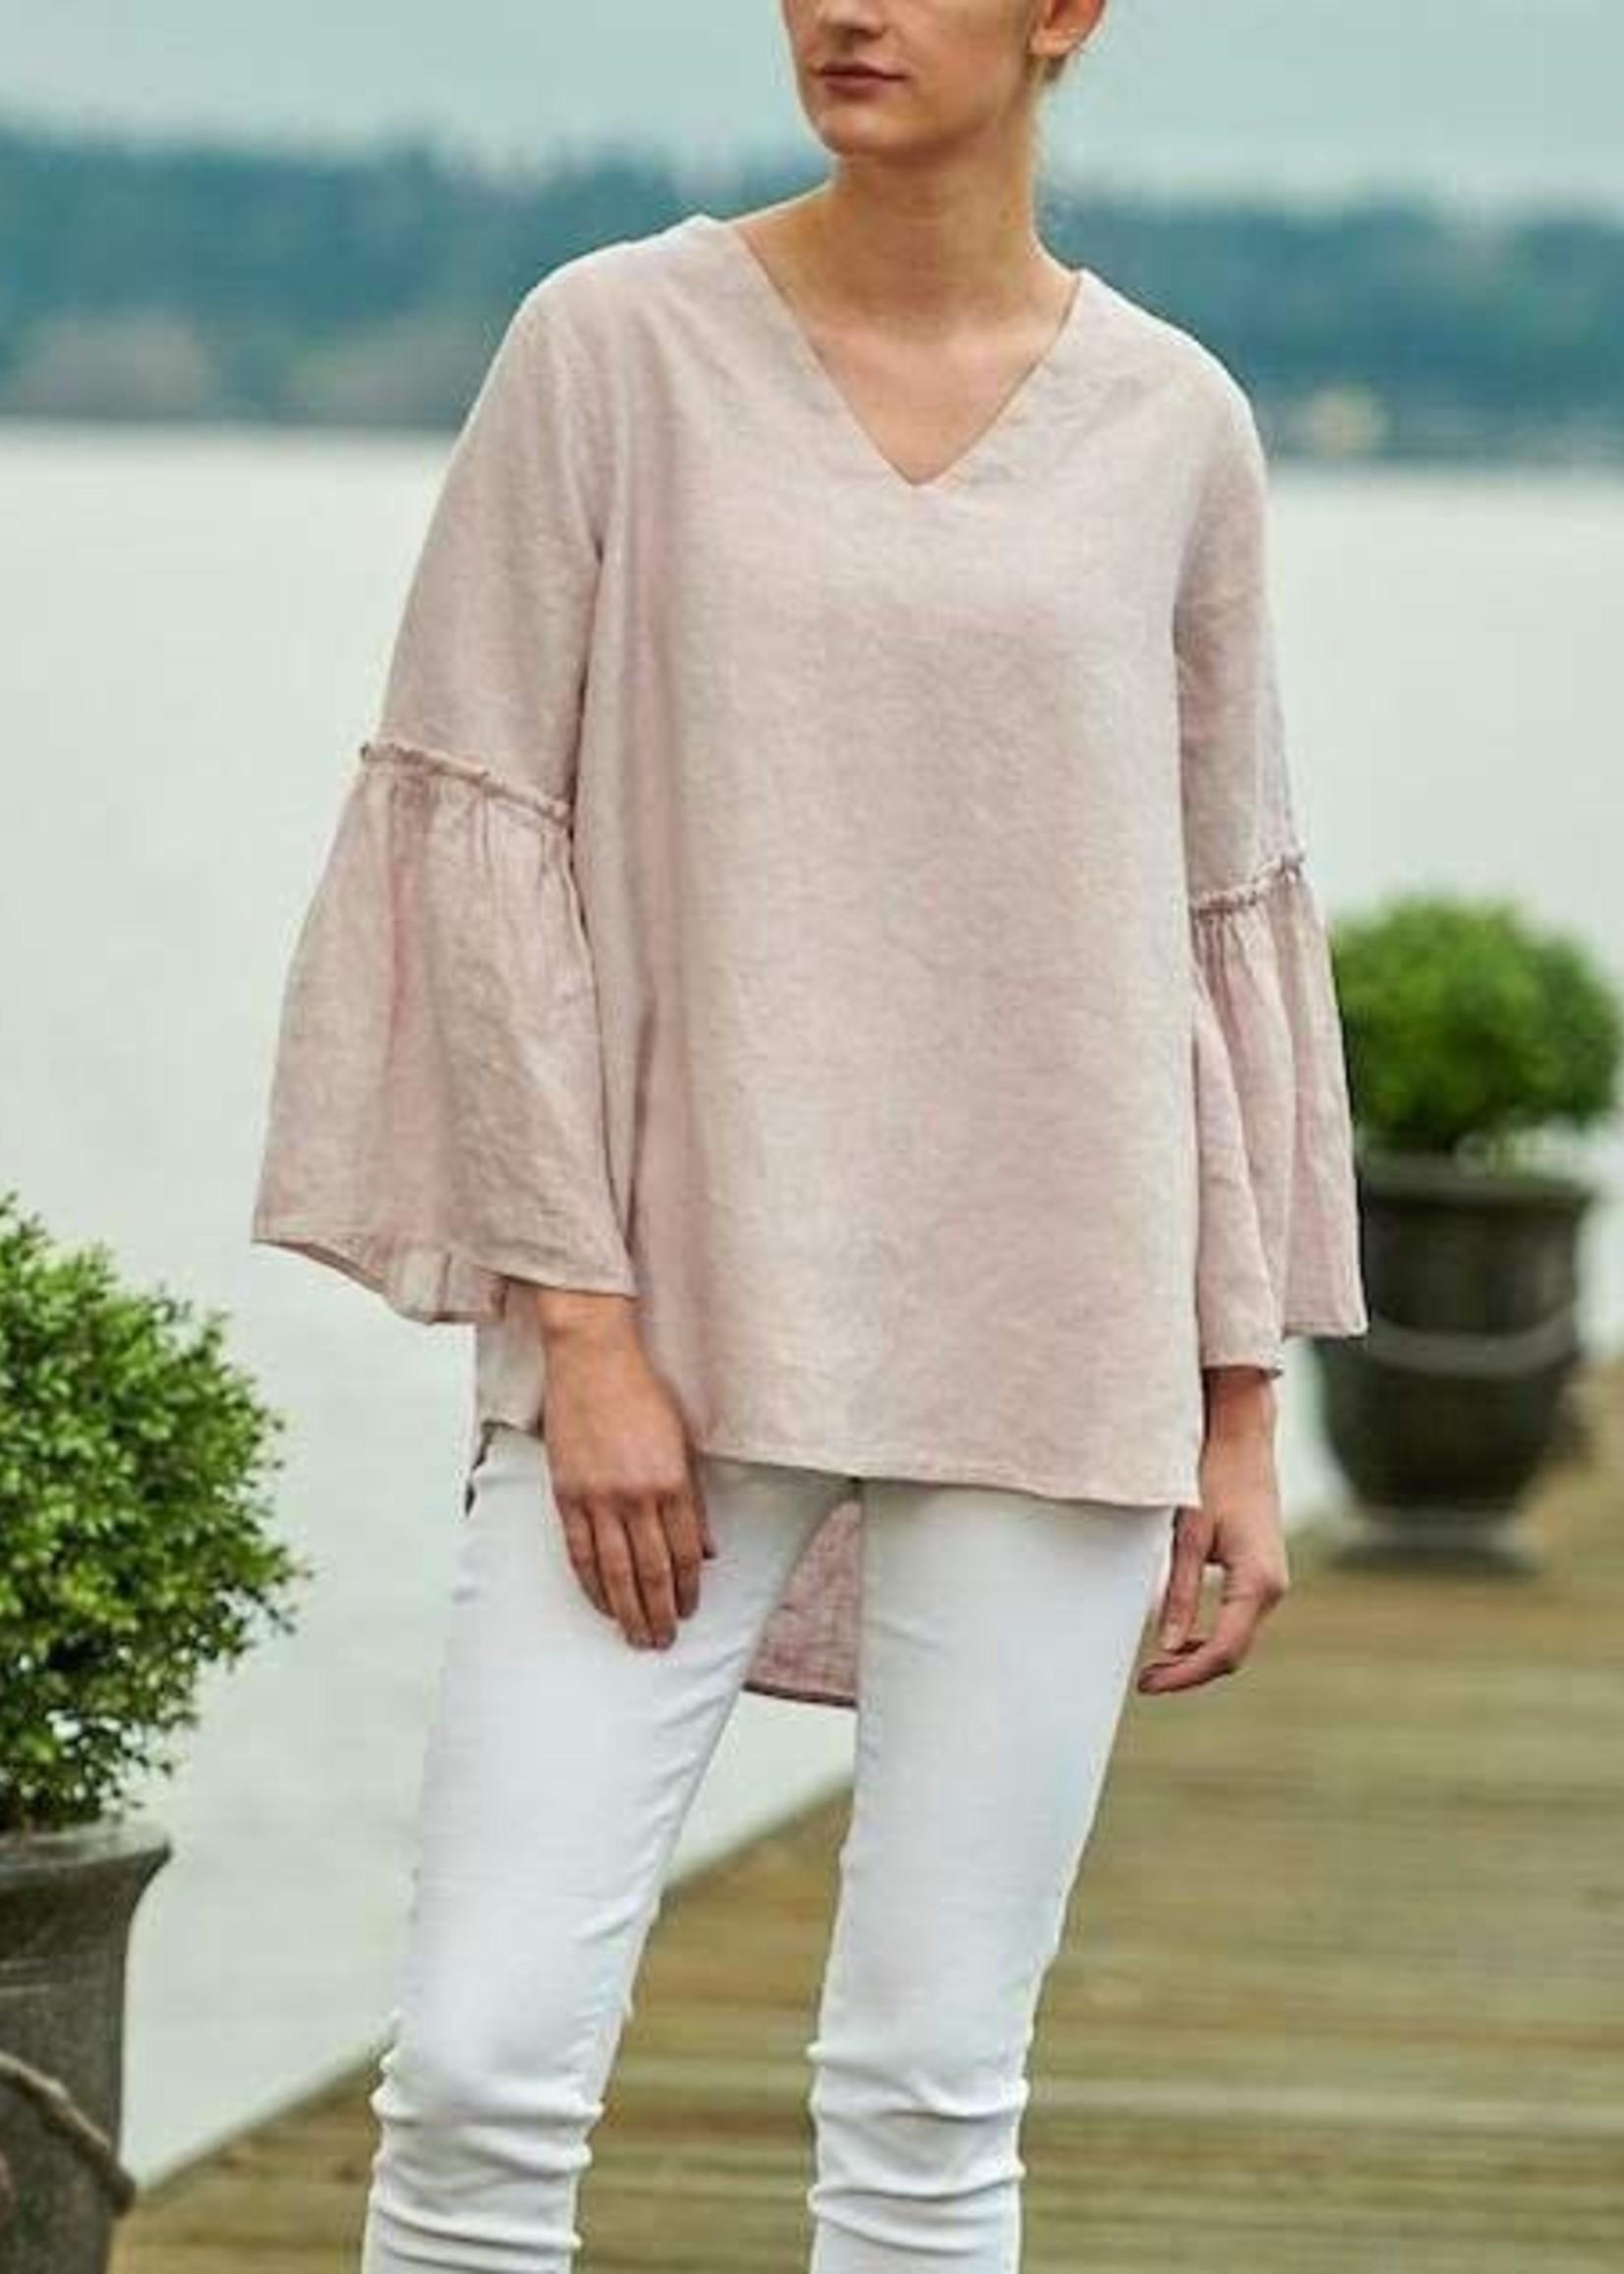 Crown Linen Designs Maya Top, Dusty Pink, L